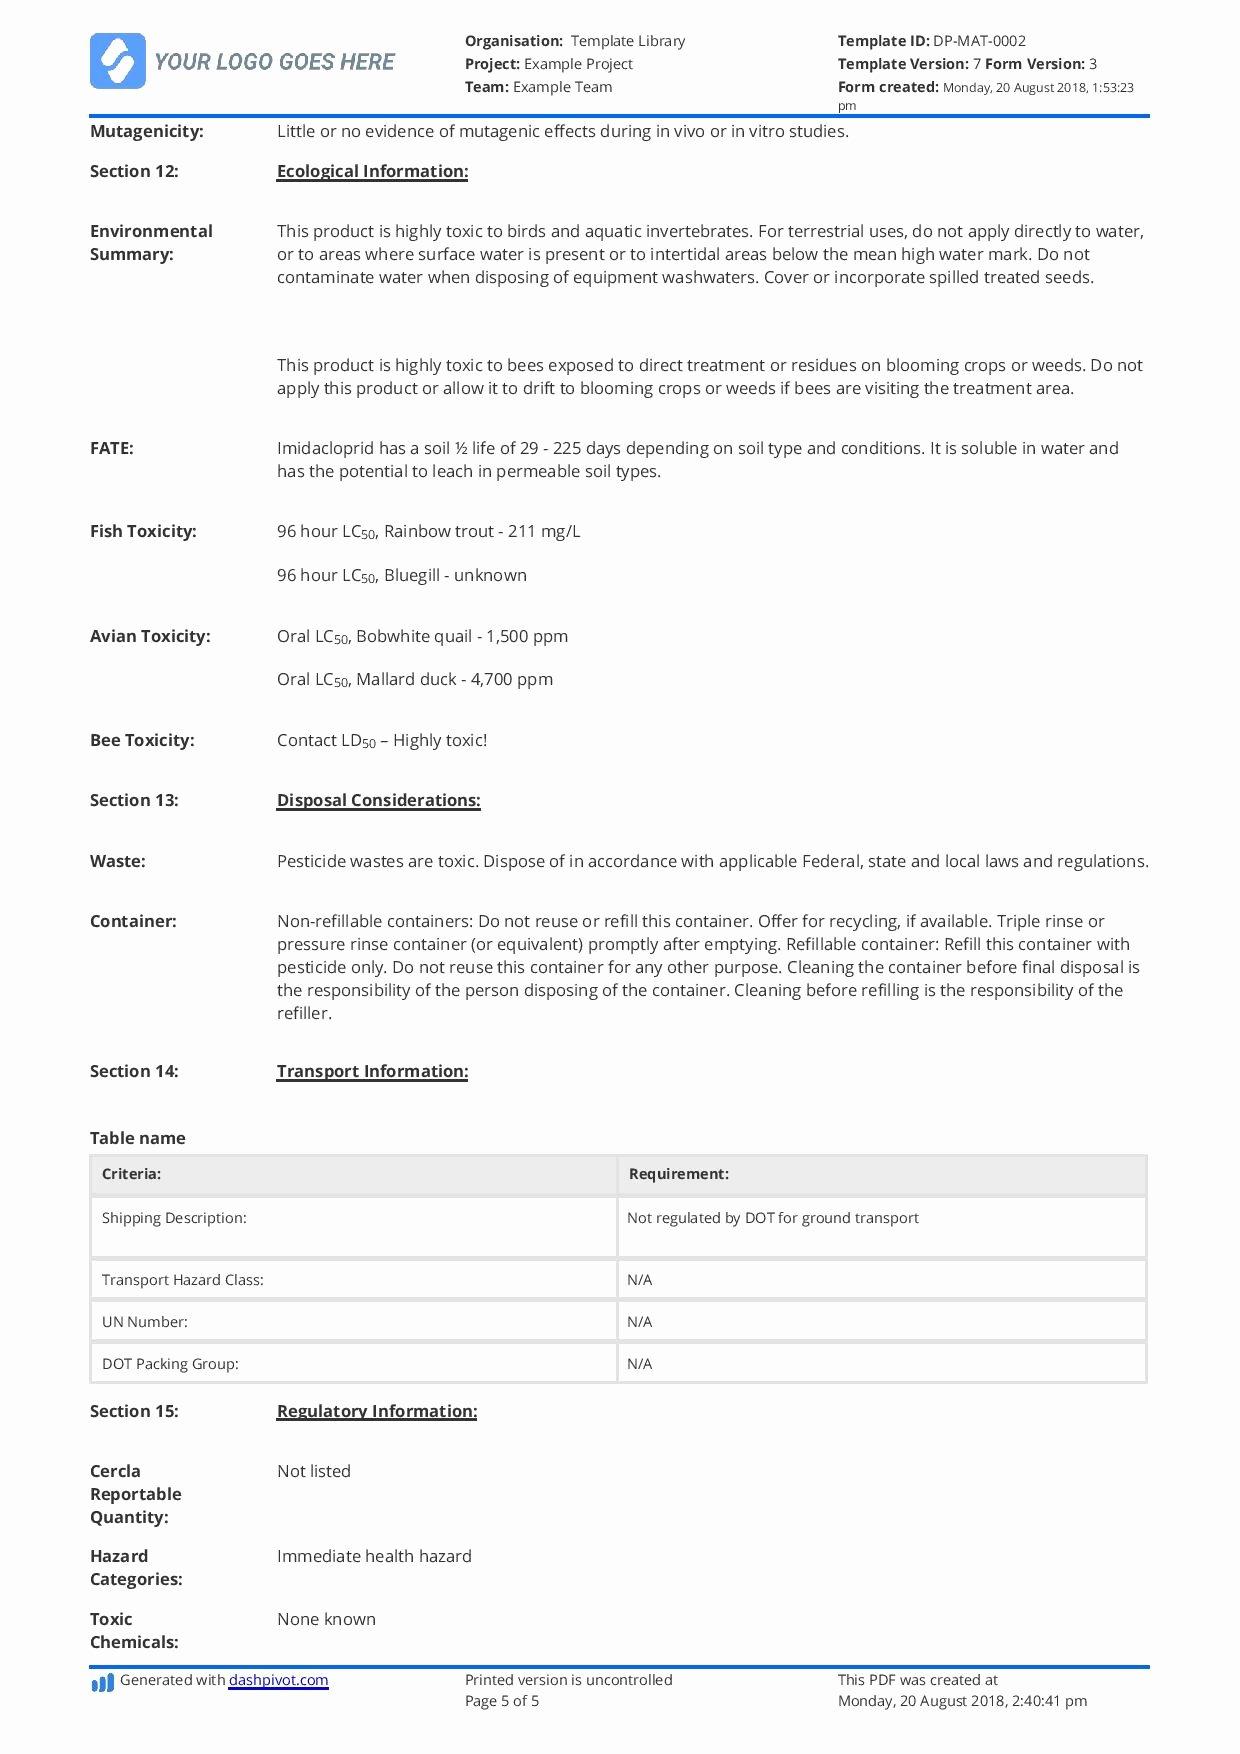 Free Data Sheet Template Elegant Free Material Safety Data Sheet Template Better Than Word